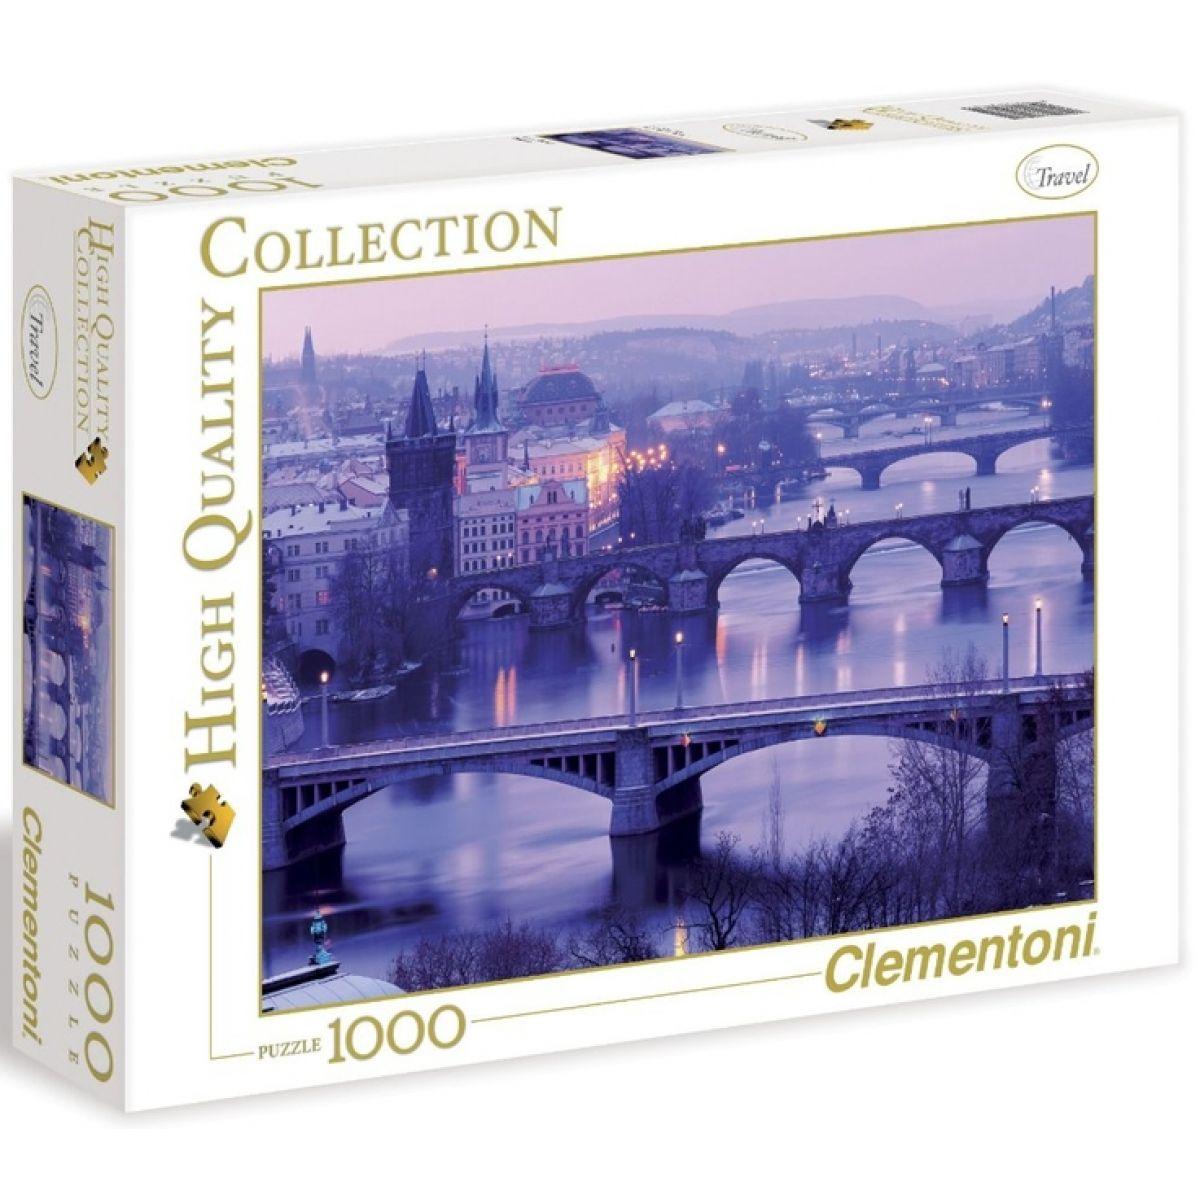 Clementoni 39161 - Puzzle 1000, Praha